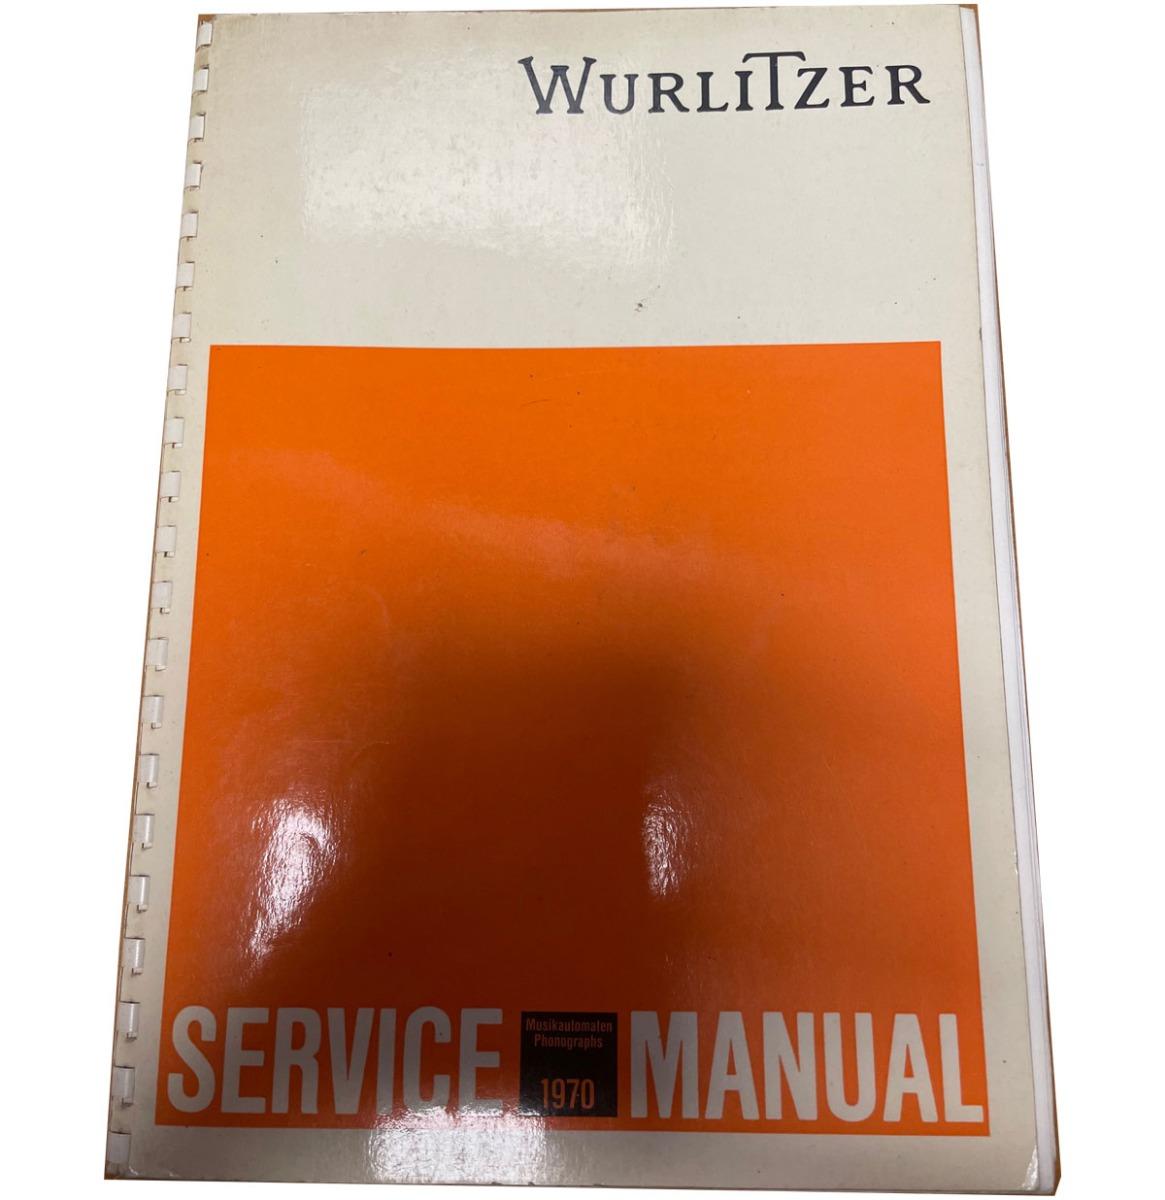 Wurlitzer Manual 1970 Origineel